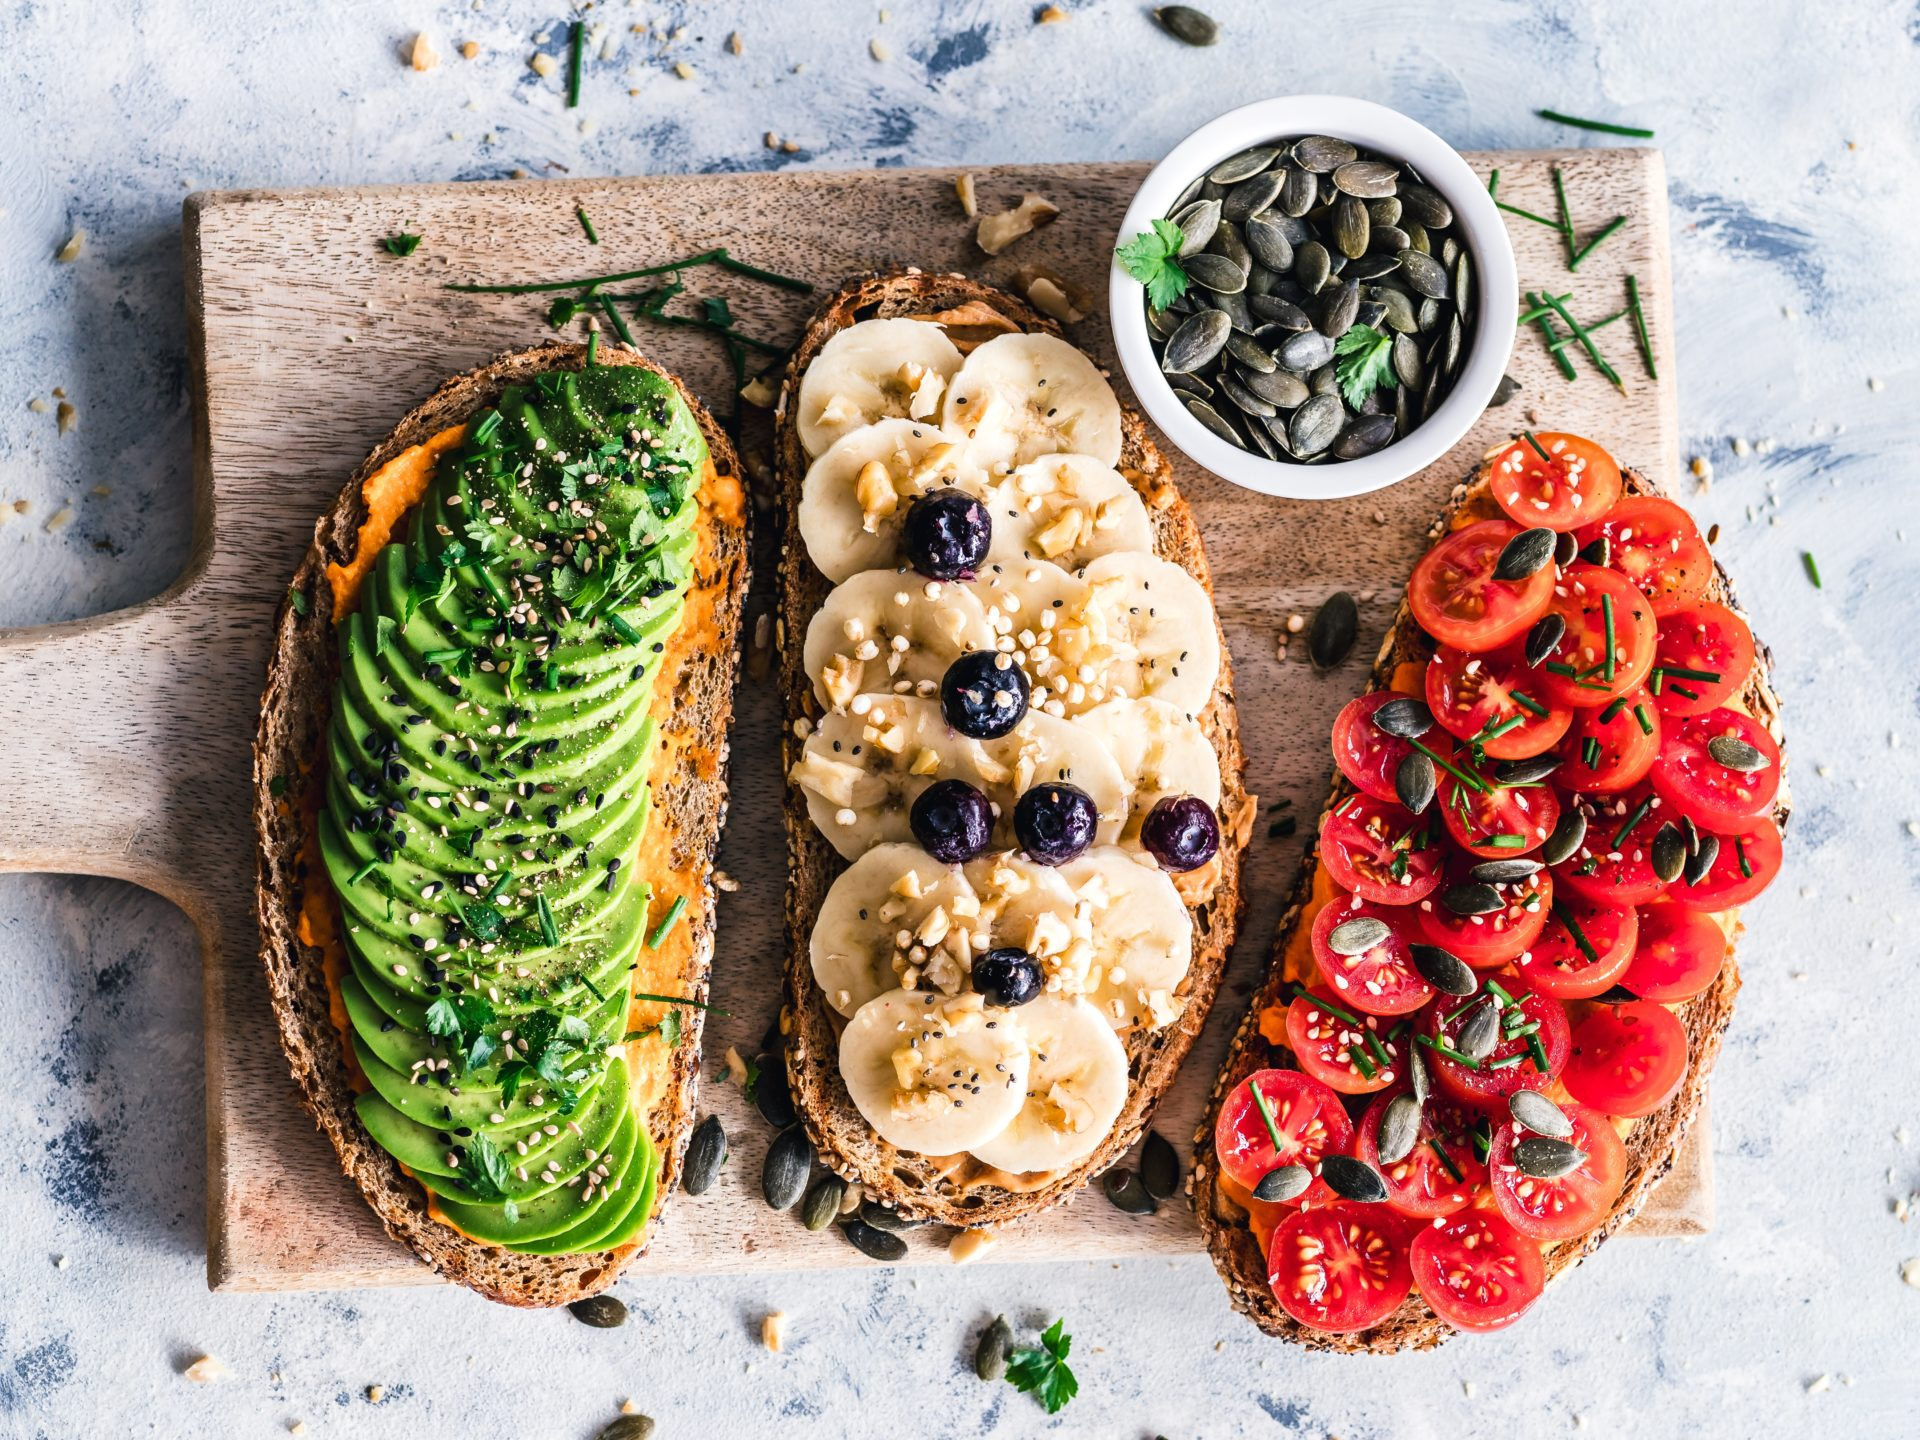 plant-based sandwiches